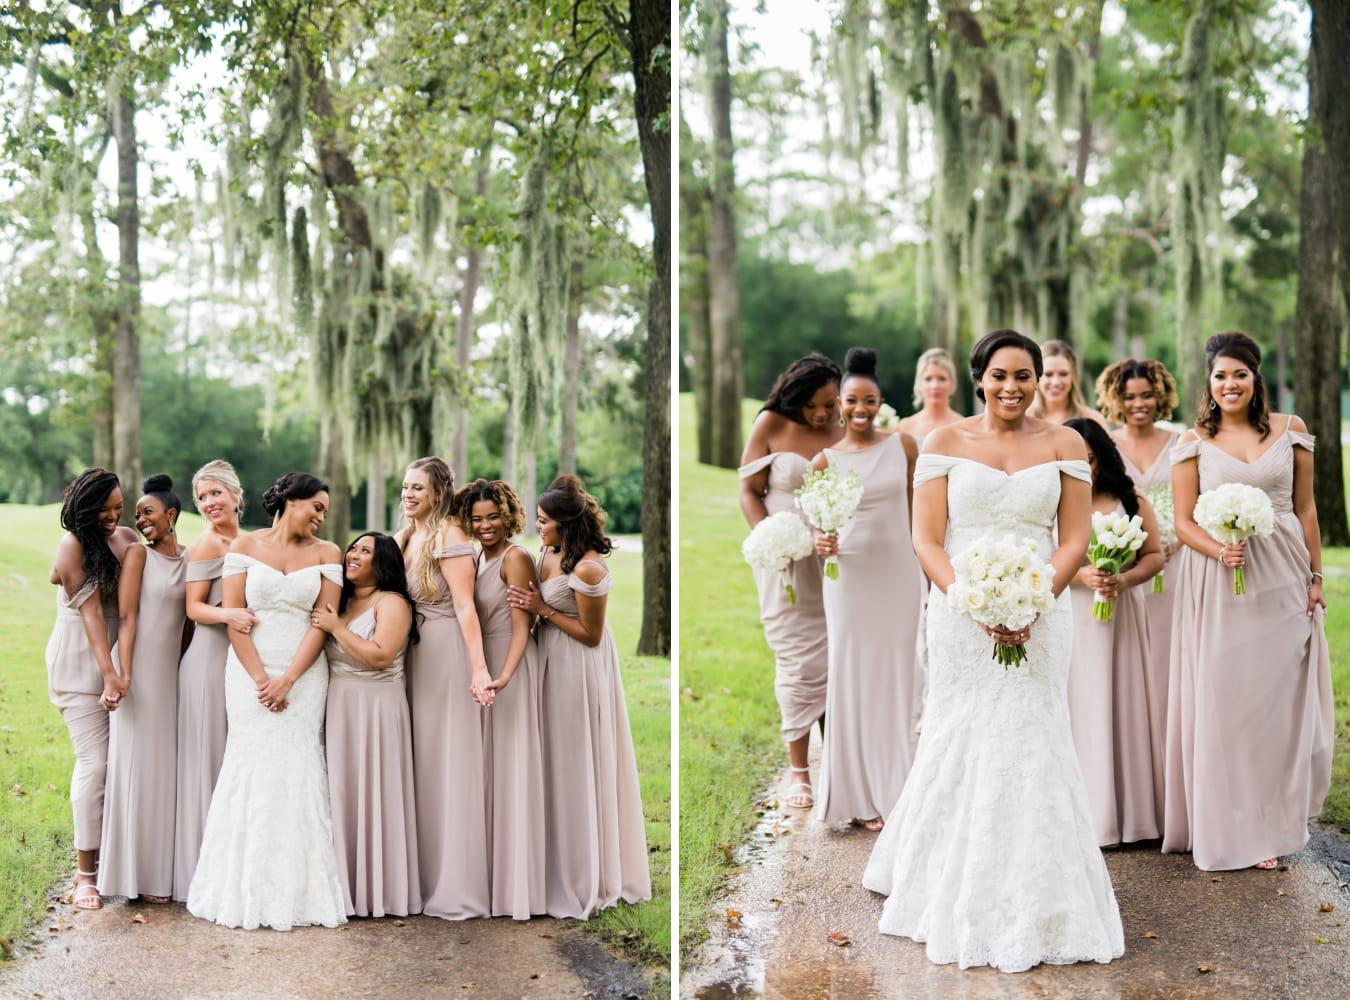 Houston Wedding- Pharris Photography- Ceremony- Kristin + Robert- Bride & Bridesmaids